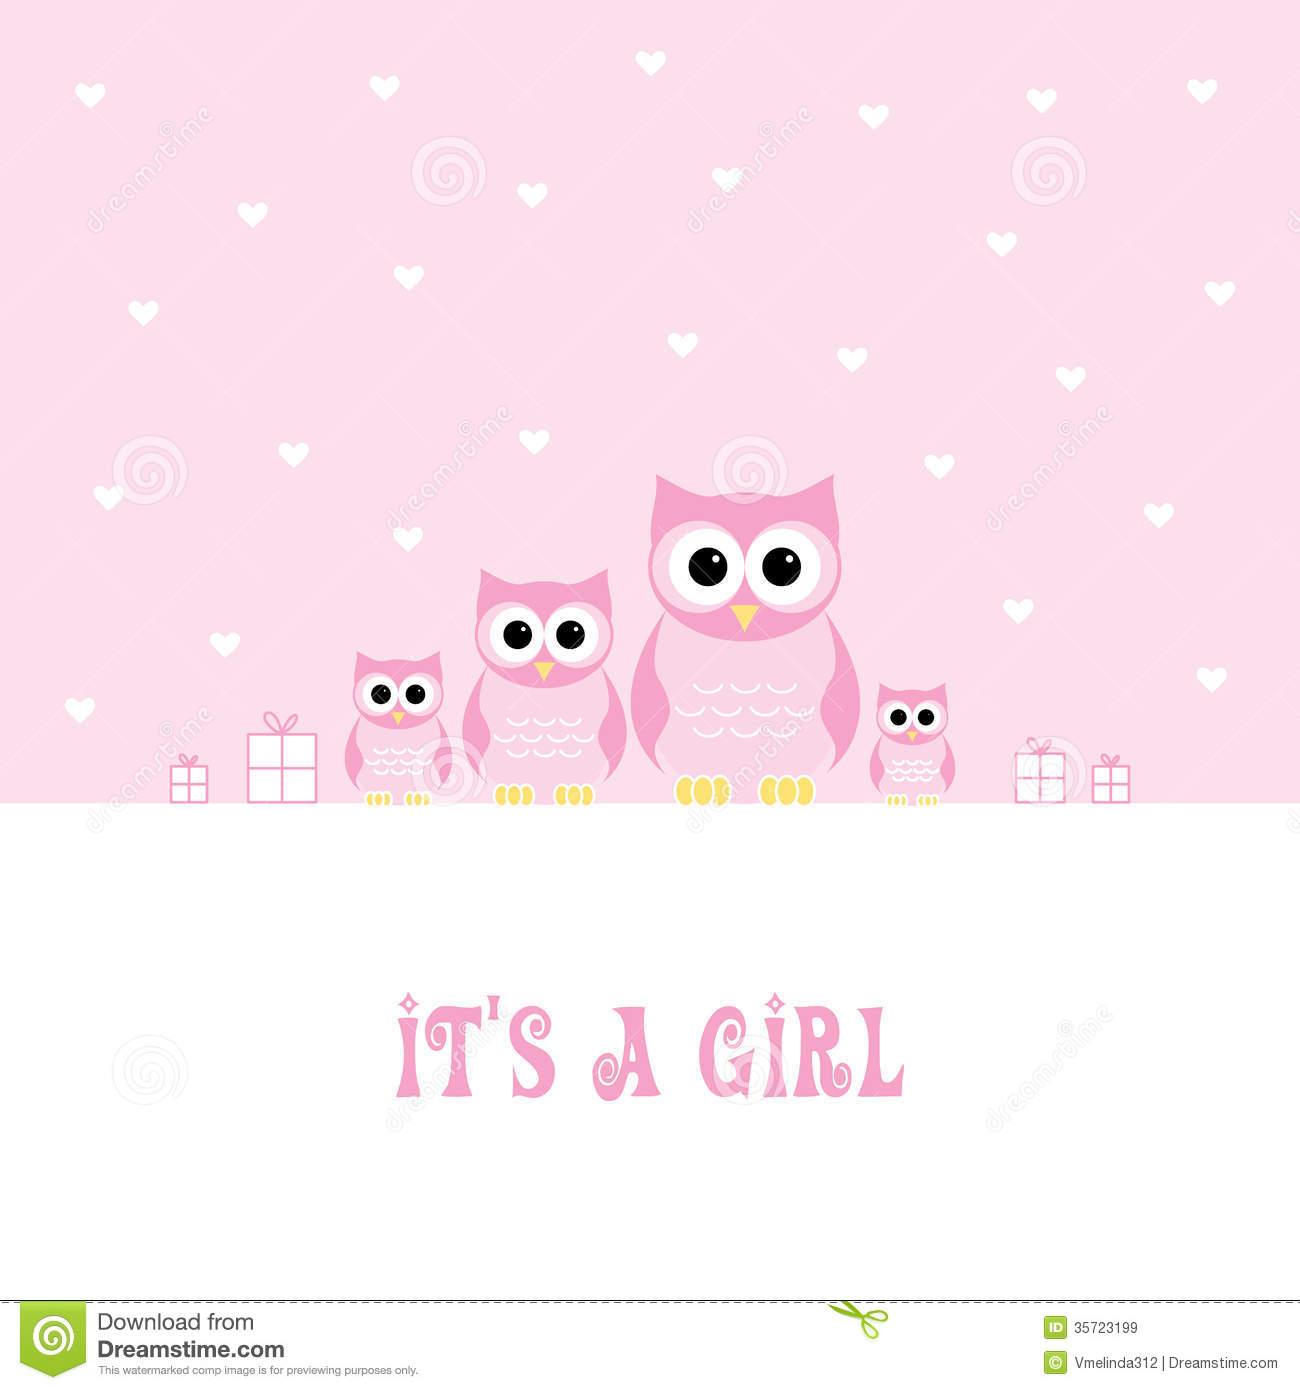 Baby Girl Wallpaper: It's A Girl Wallpaper Background